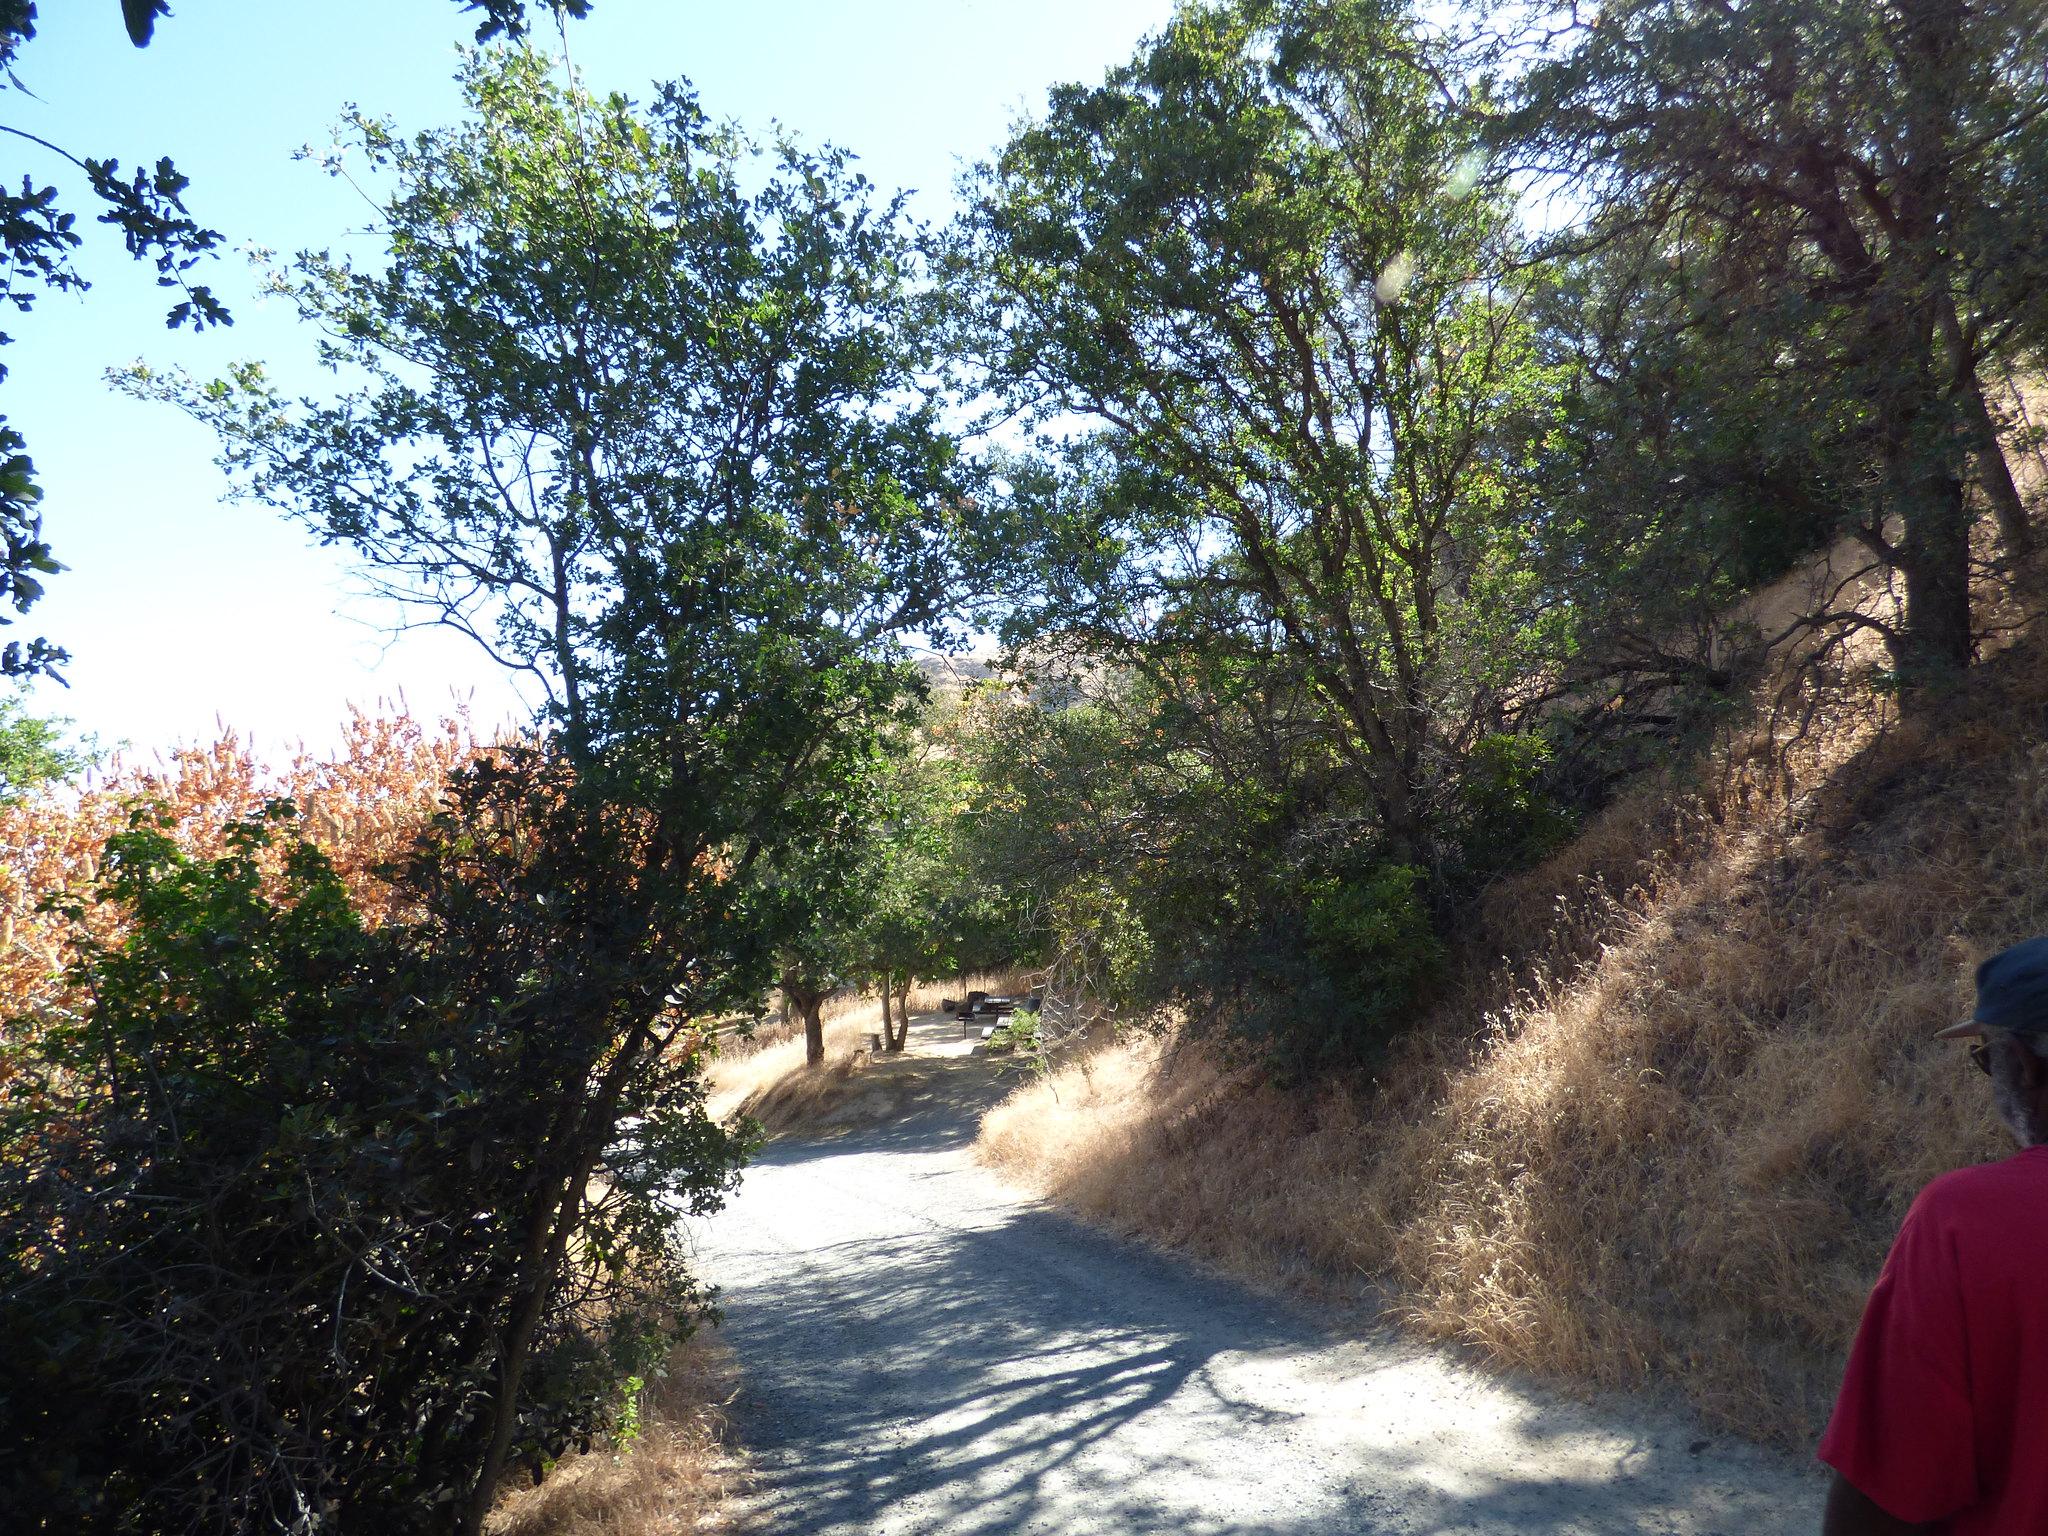 2018-06-22 - A short walk through Black Diamond Regional Park